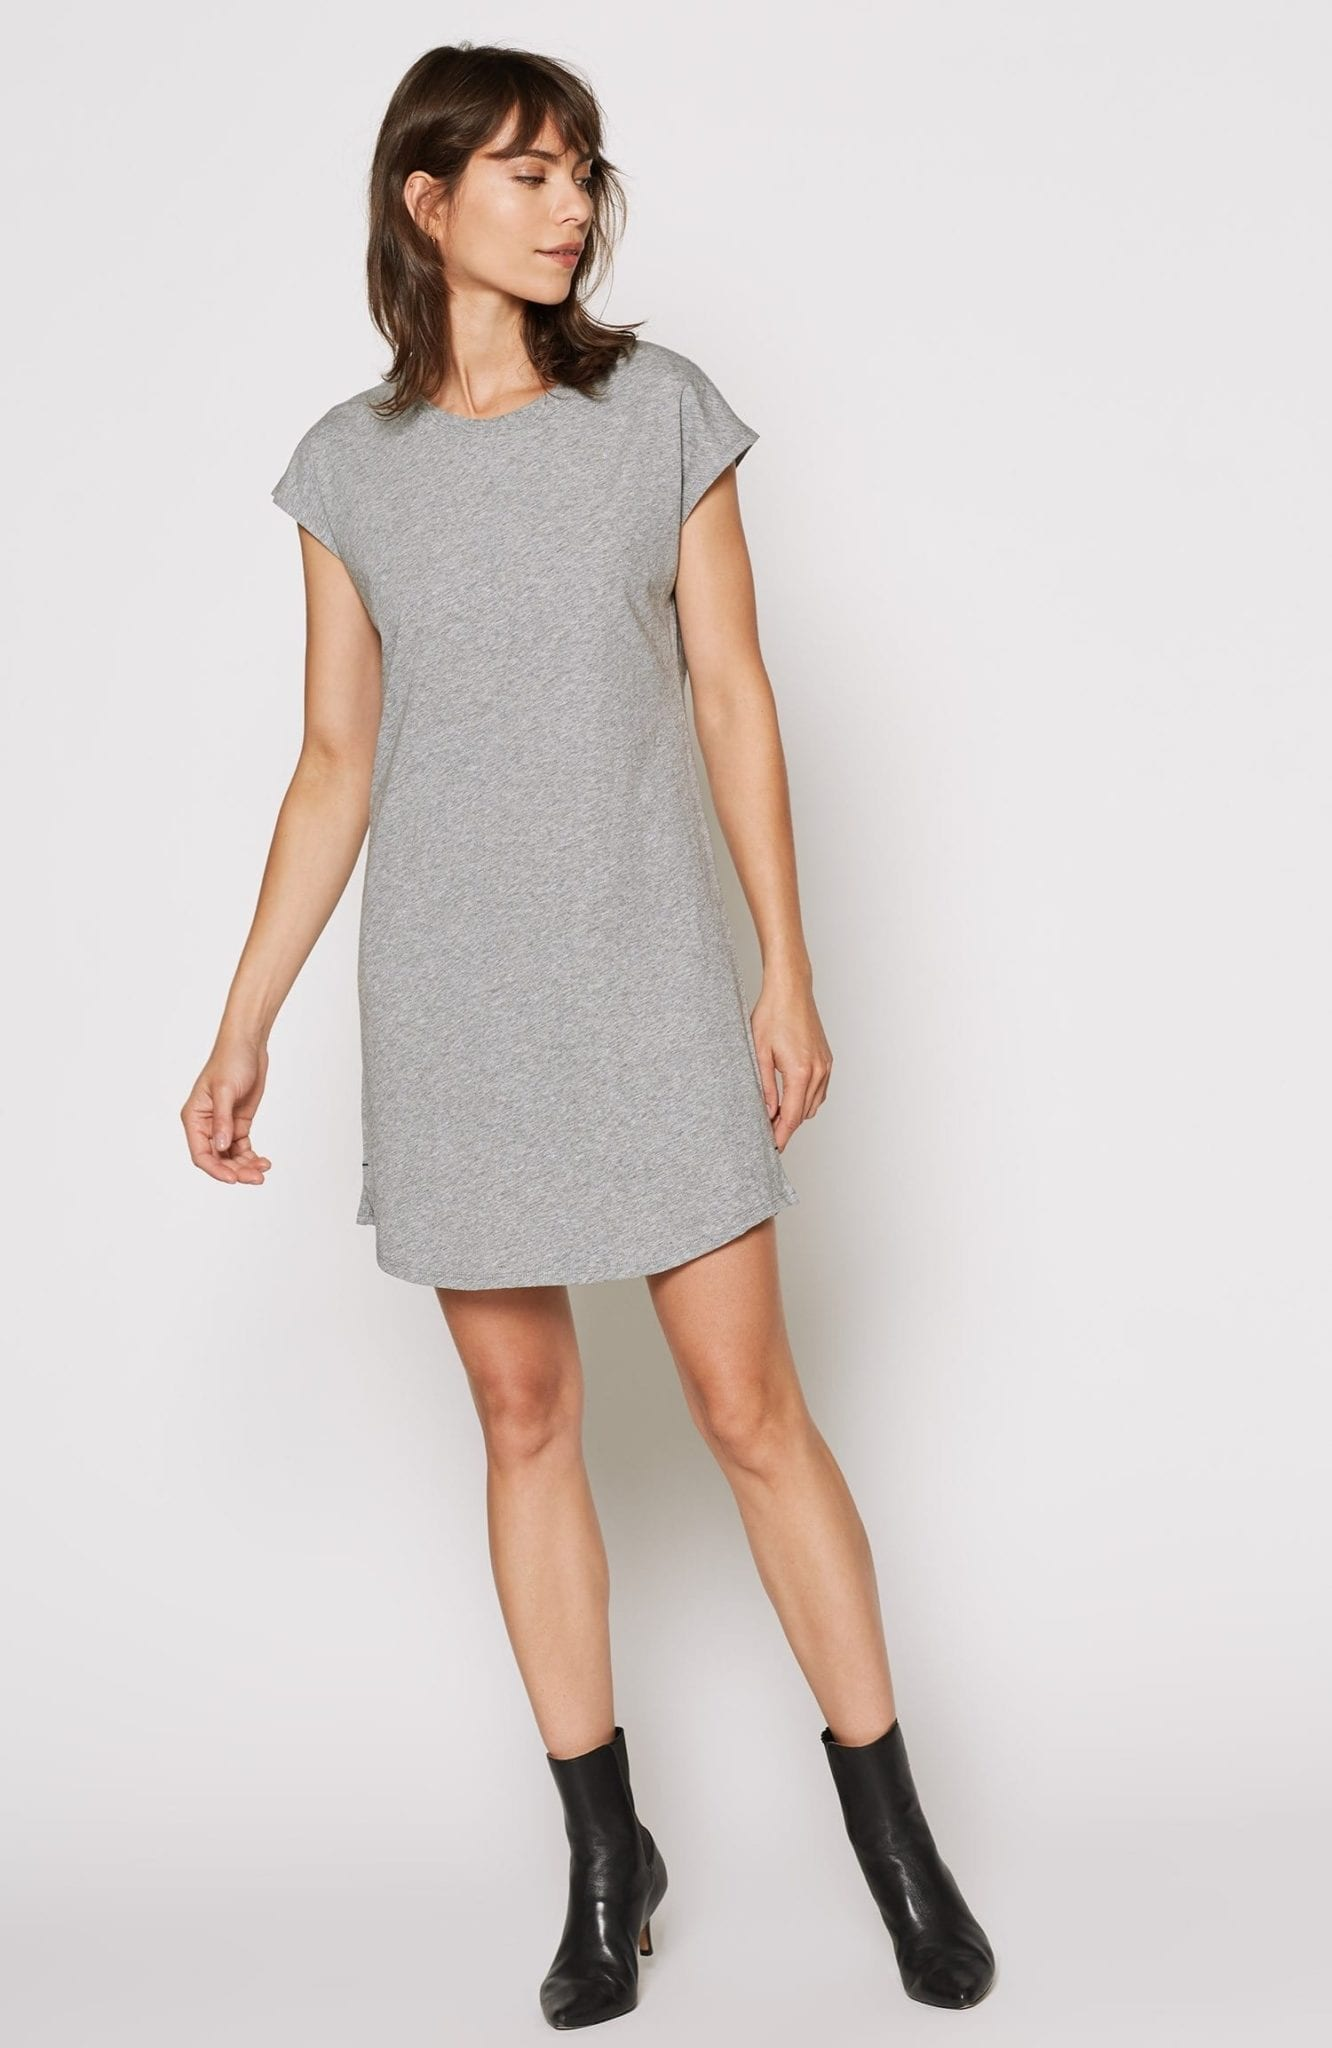 JOIE Lamisa Grey Dress